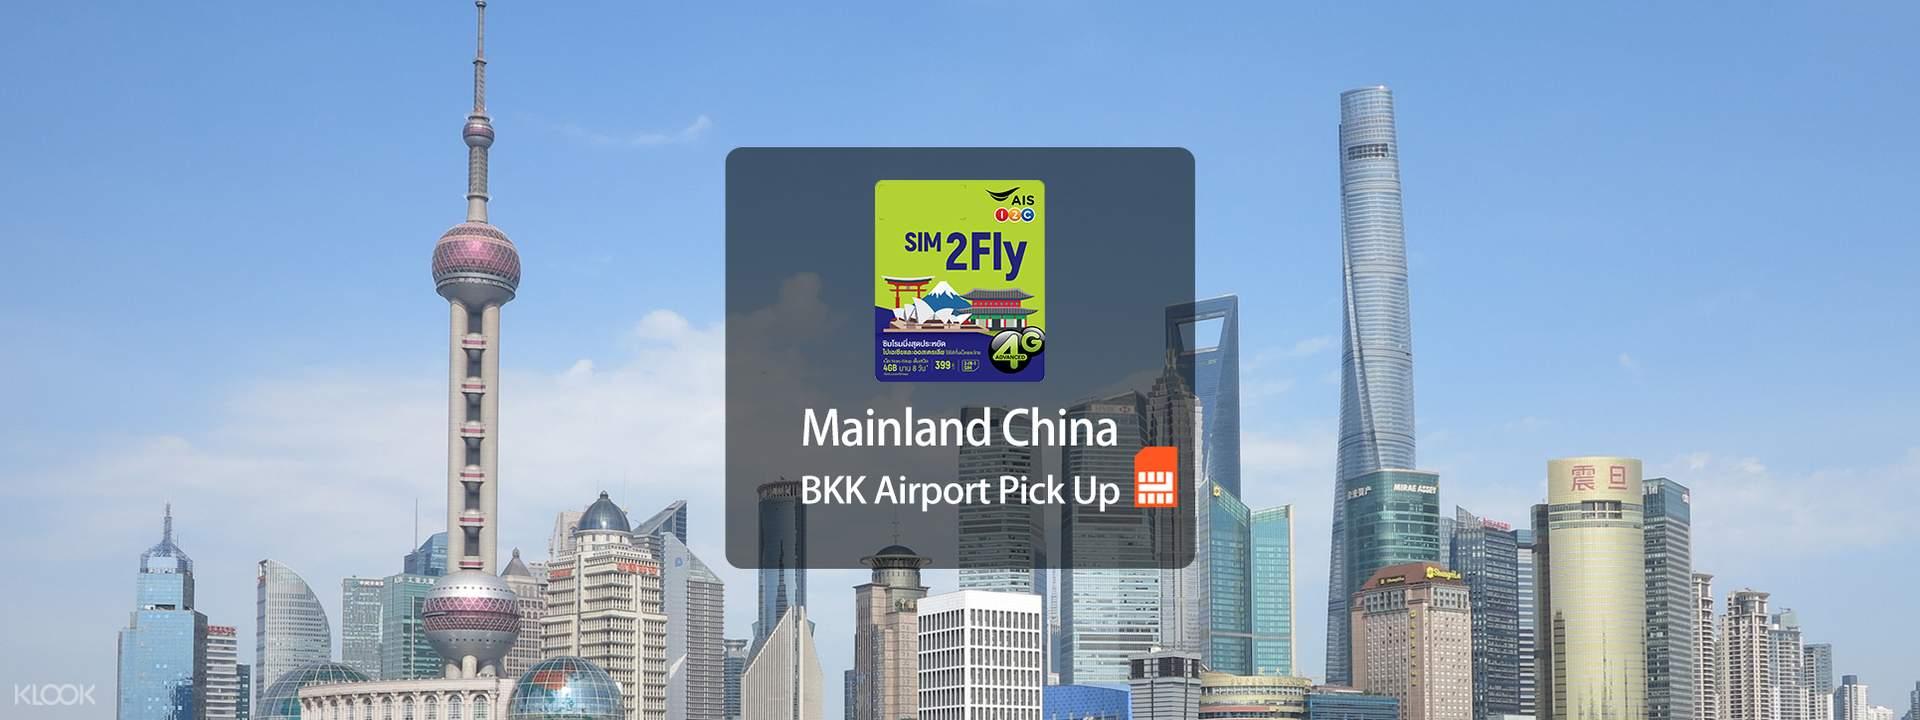 AIS 4G SIM Card (BKK Airport Pick Up) for Mainland China